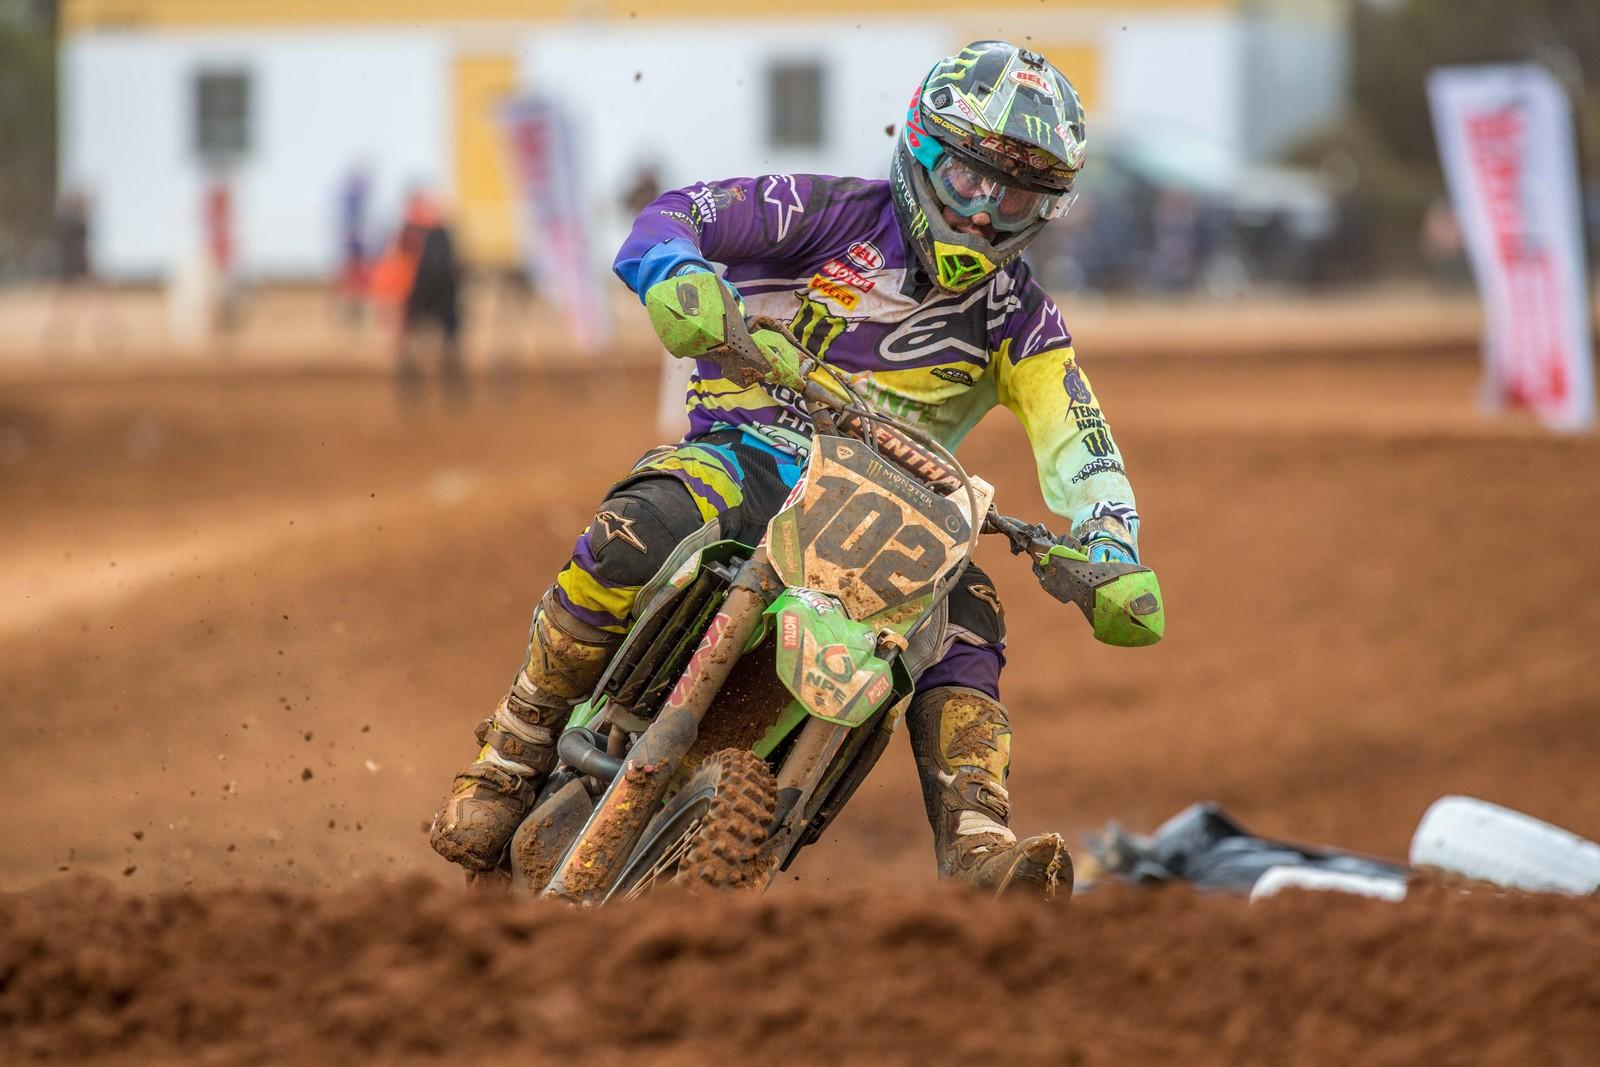 Matt Moss - Australian Motul Mx Championships: Round 4, Murray Bridge - Motocross Pictures - Vital MX